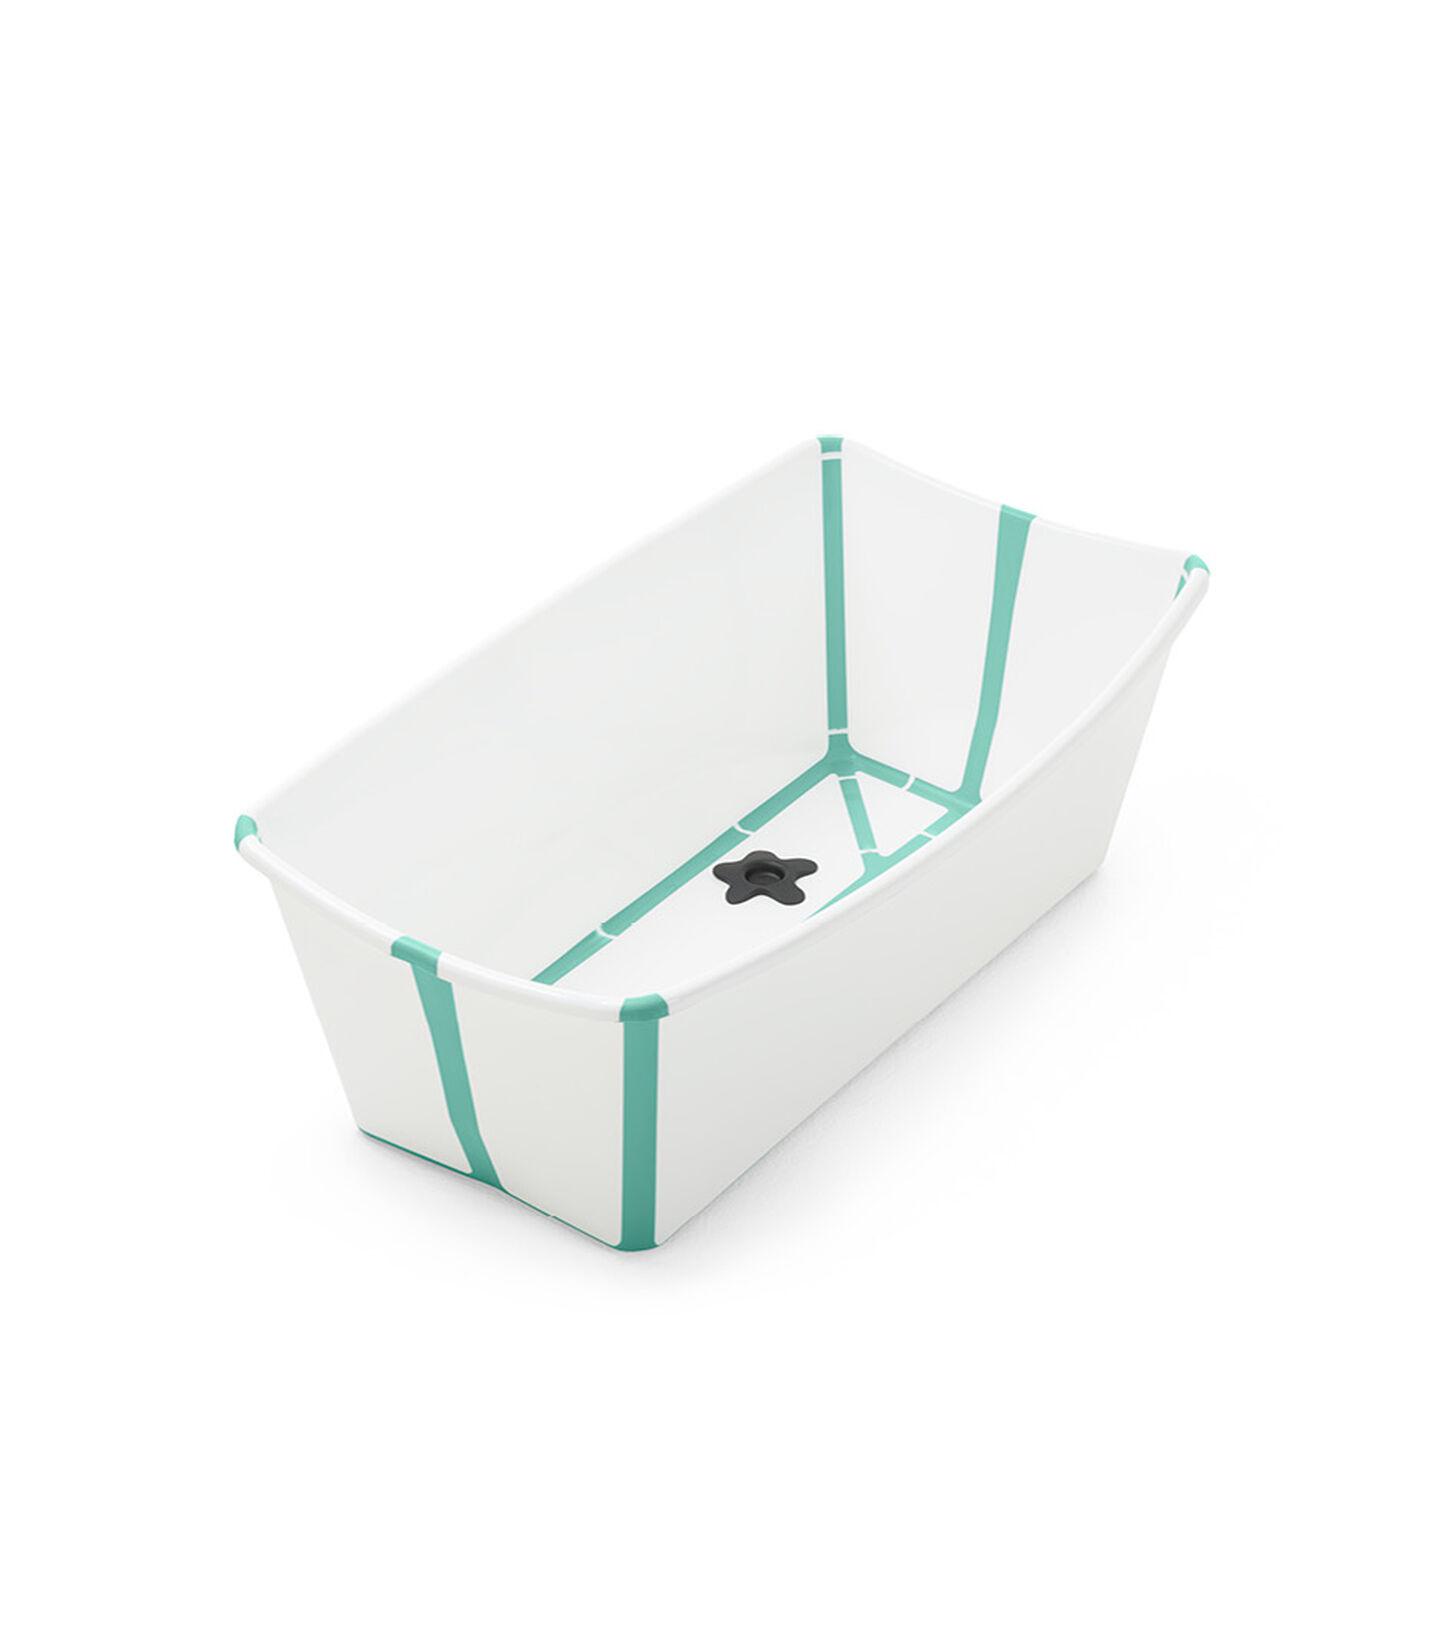 Stokke® Flexi Bath® Heat White Aqua, White Aqua, mainview view 1